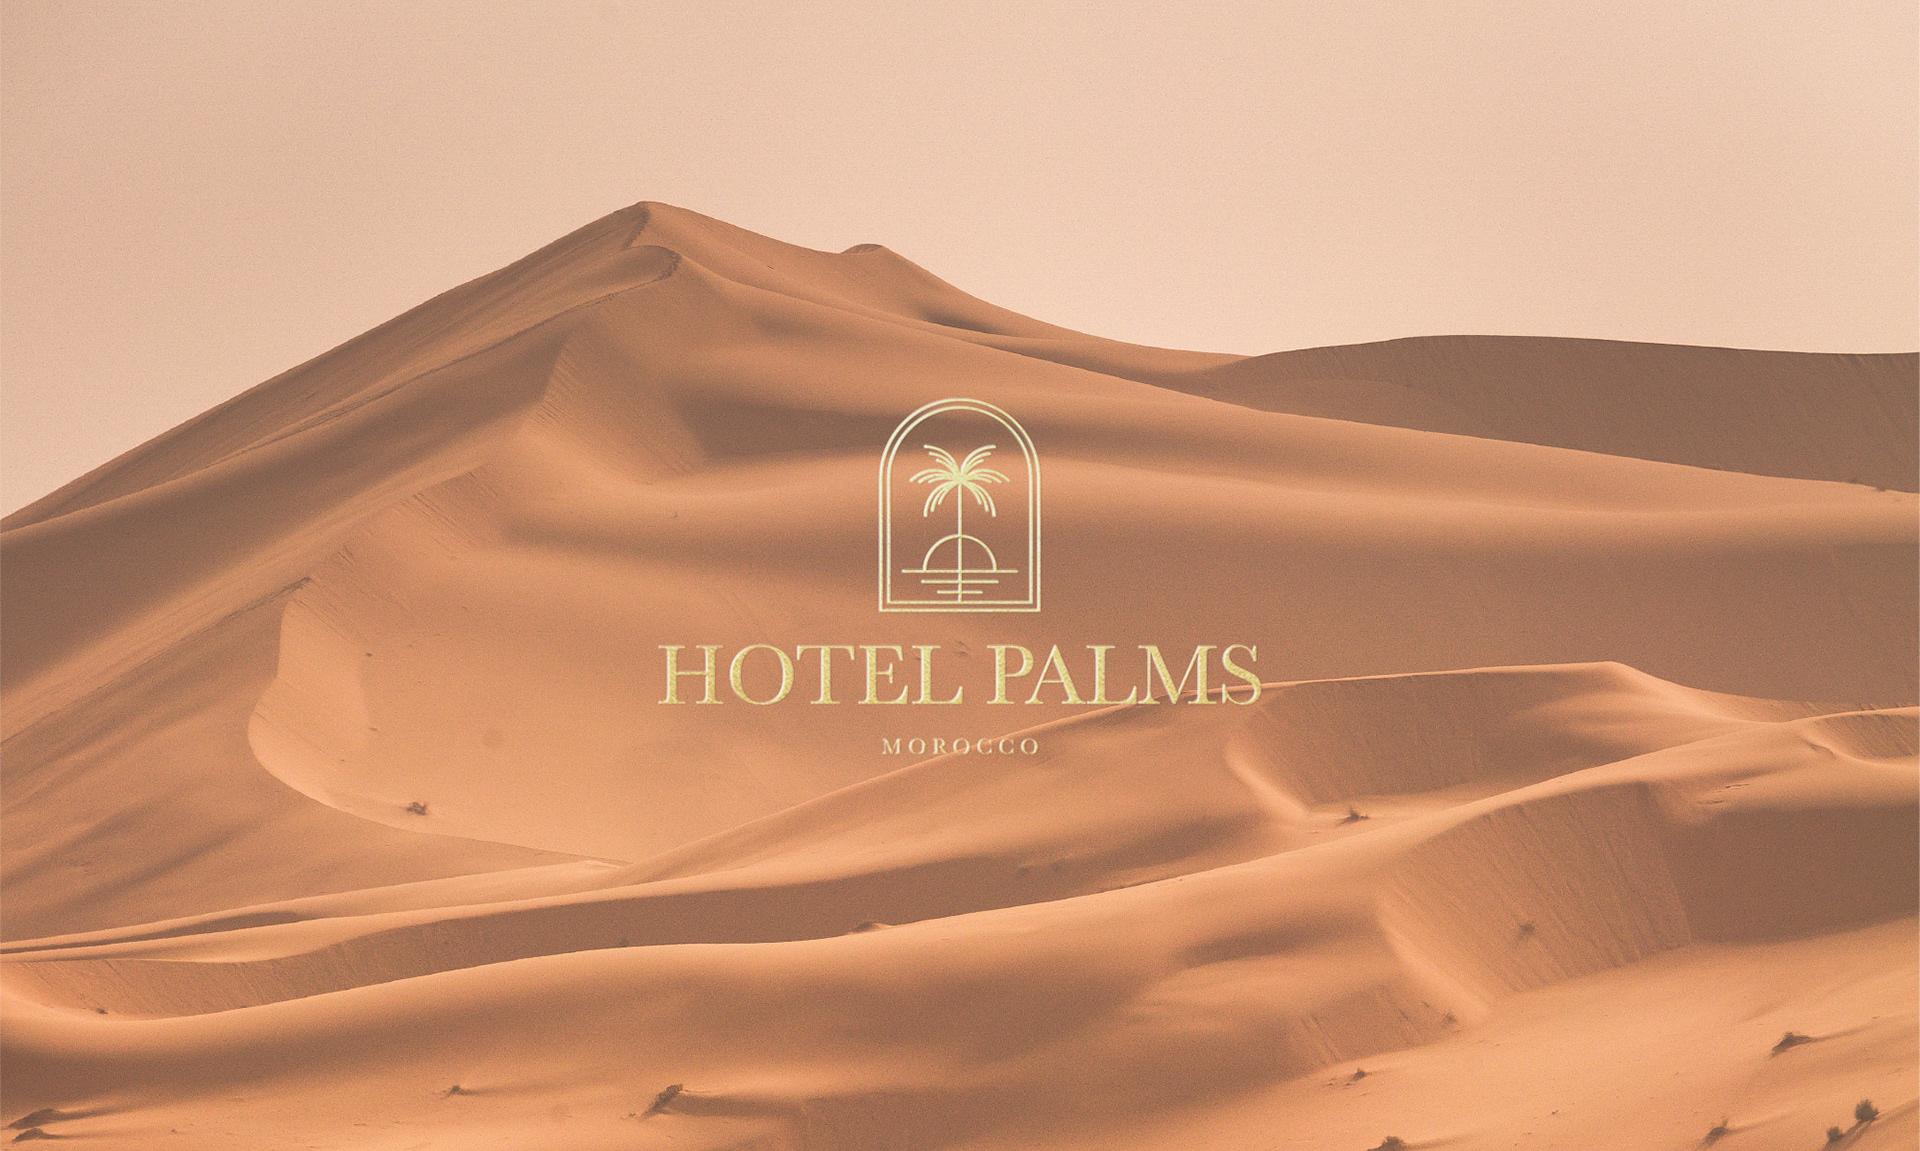 Hotel Palms Branding Design by Marka Works Branding Agency